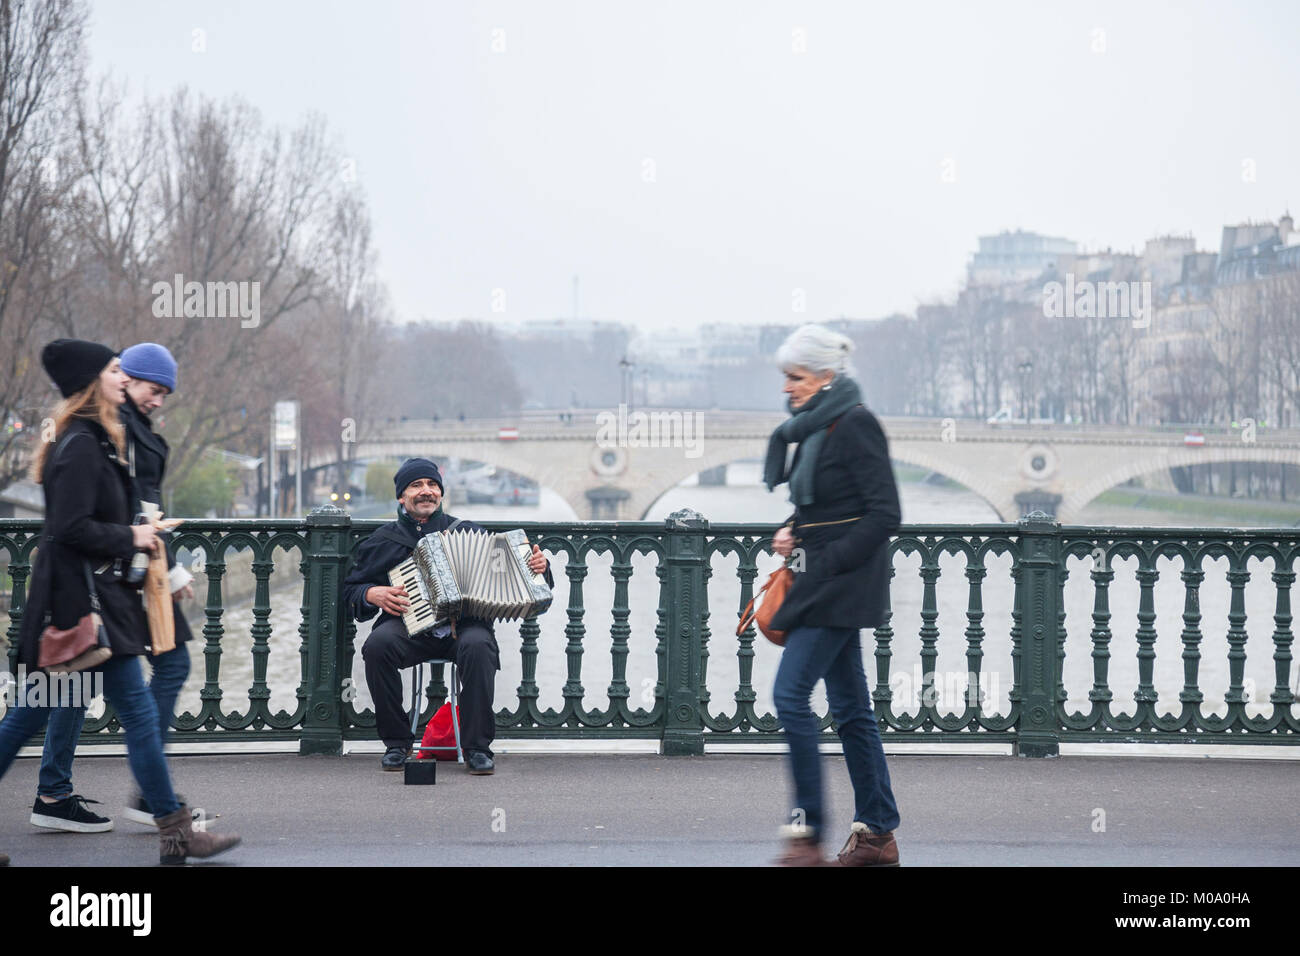 PARIS, FRANCE - DECEMBER 20, 2017:  Accordionist plating accordion on the Arcole bridge in Paris, over the Seine - Stock Image